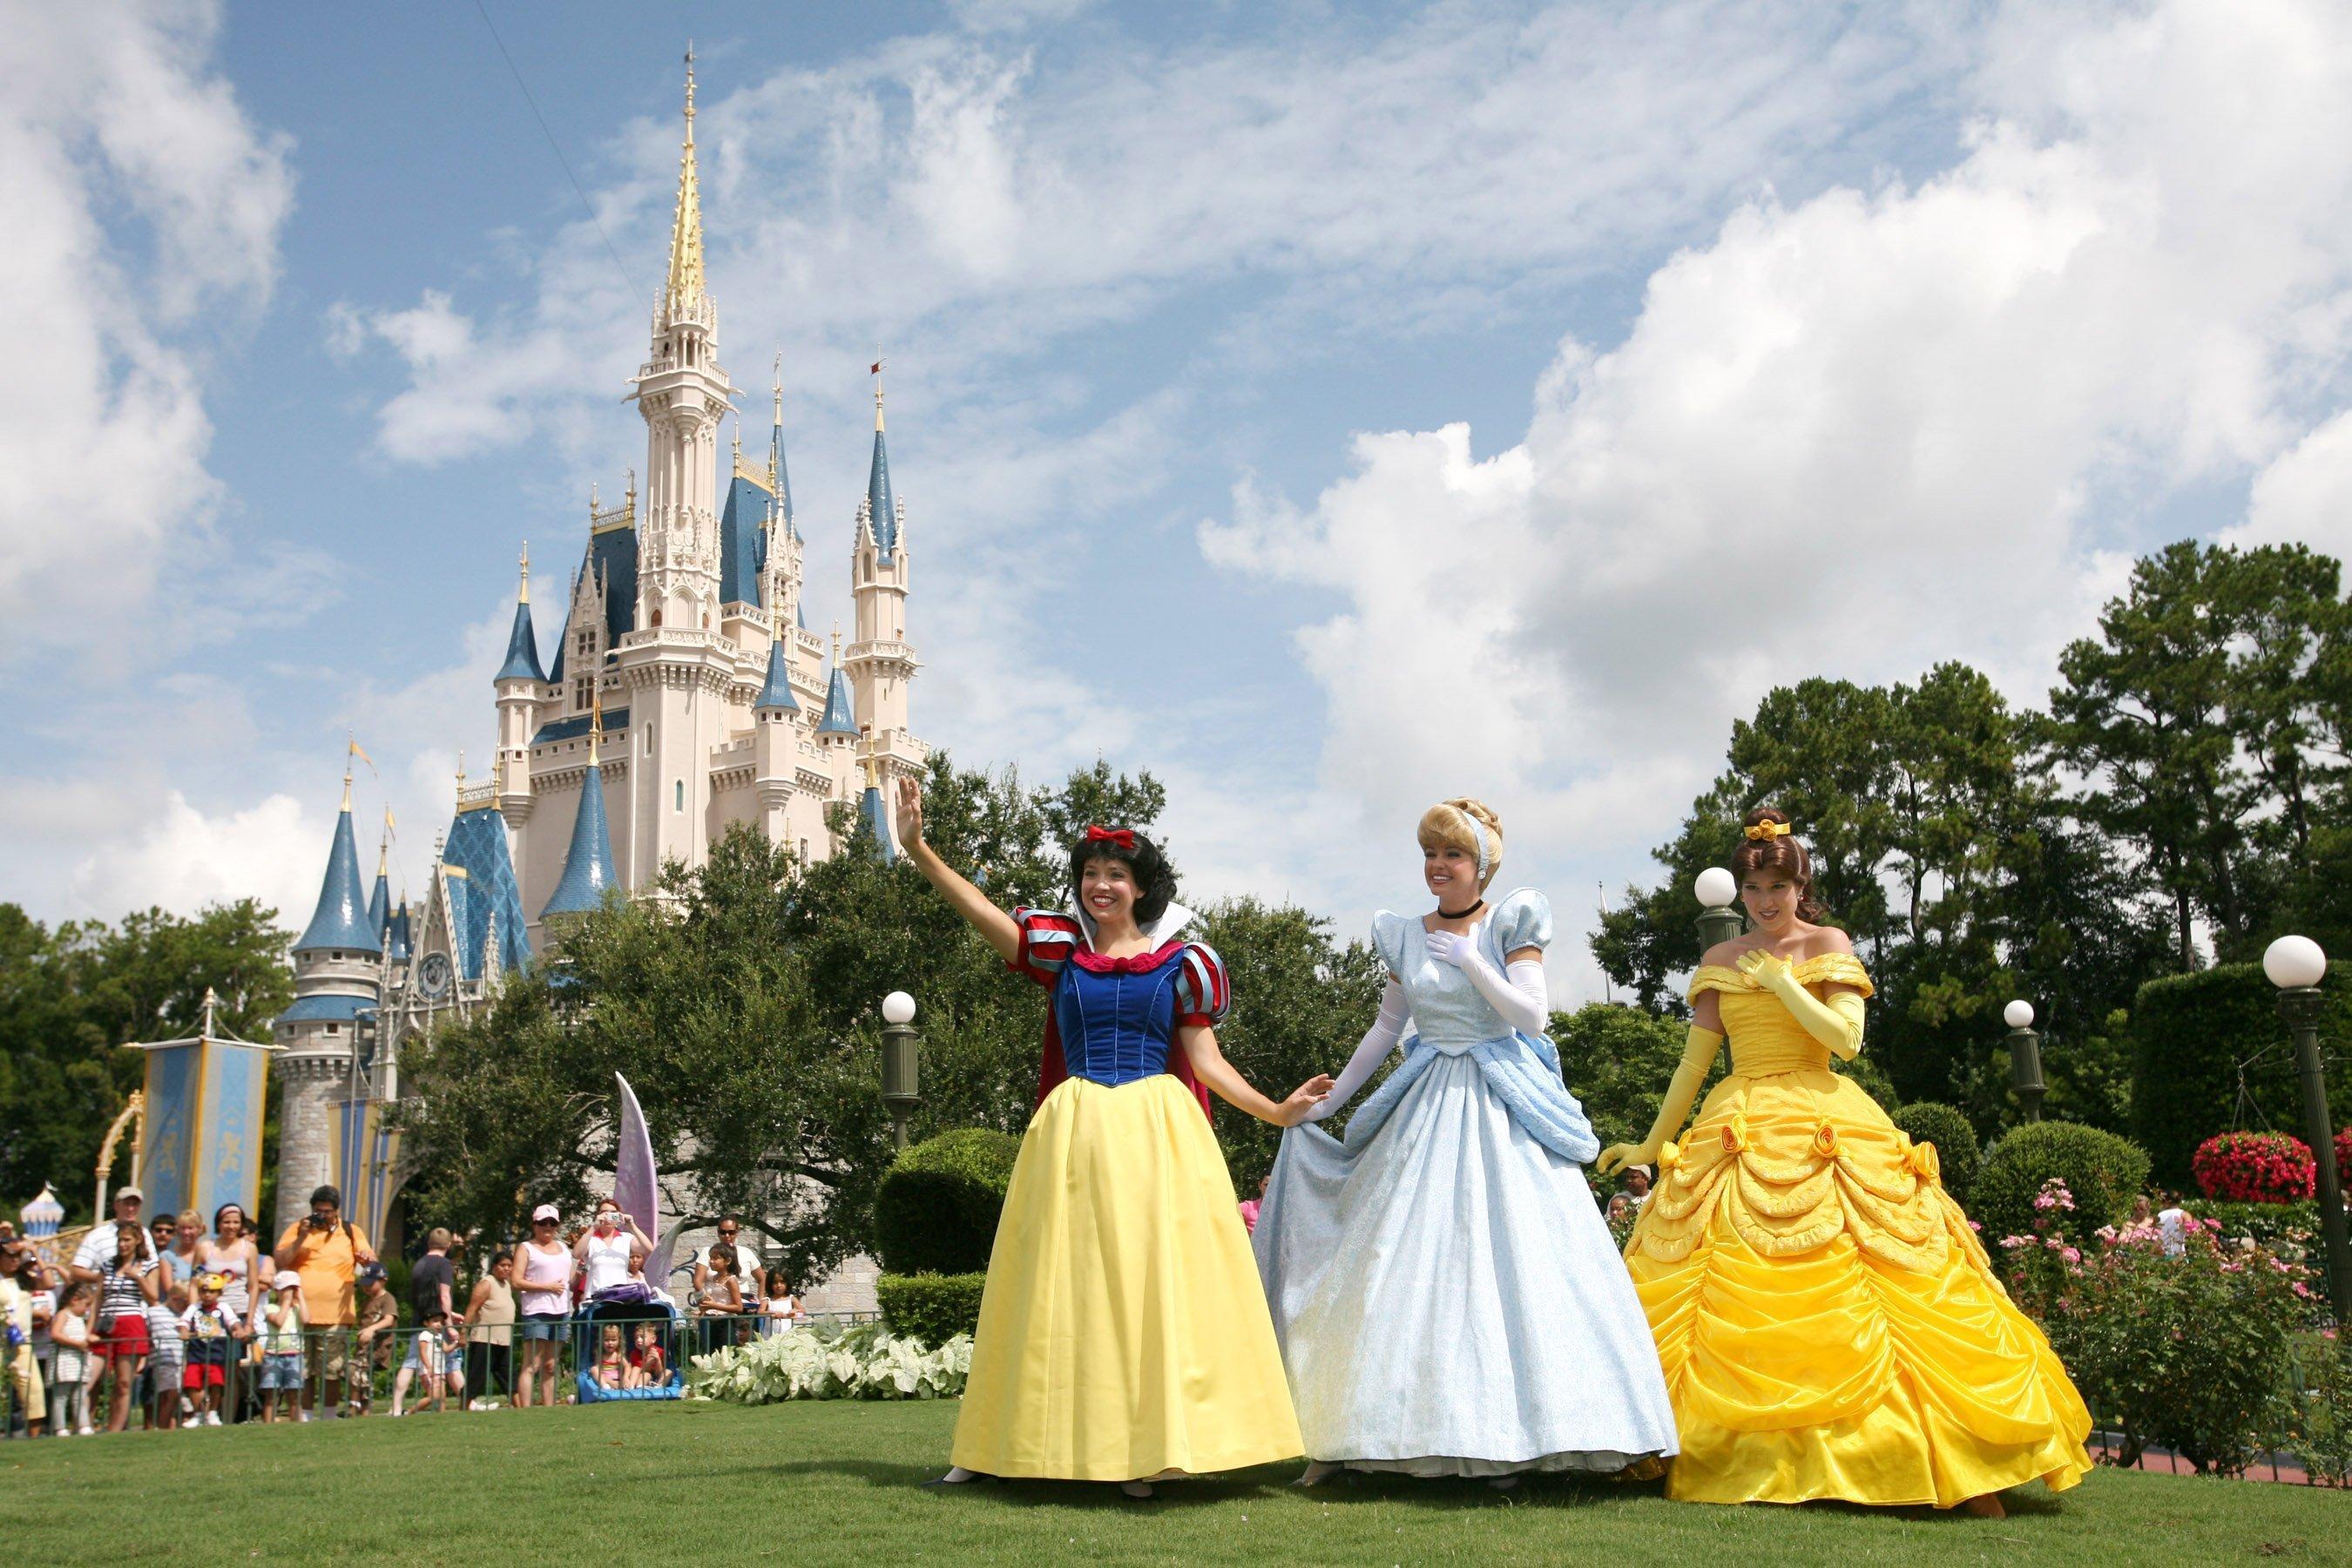 Disney unions file federal complaint over promised bonuses